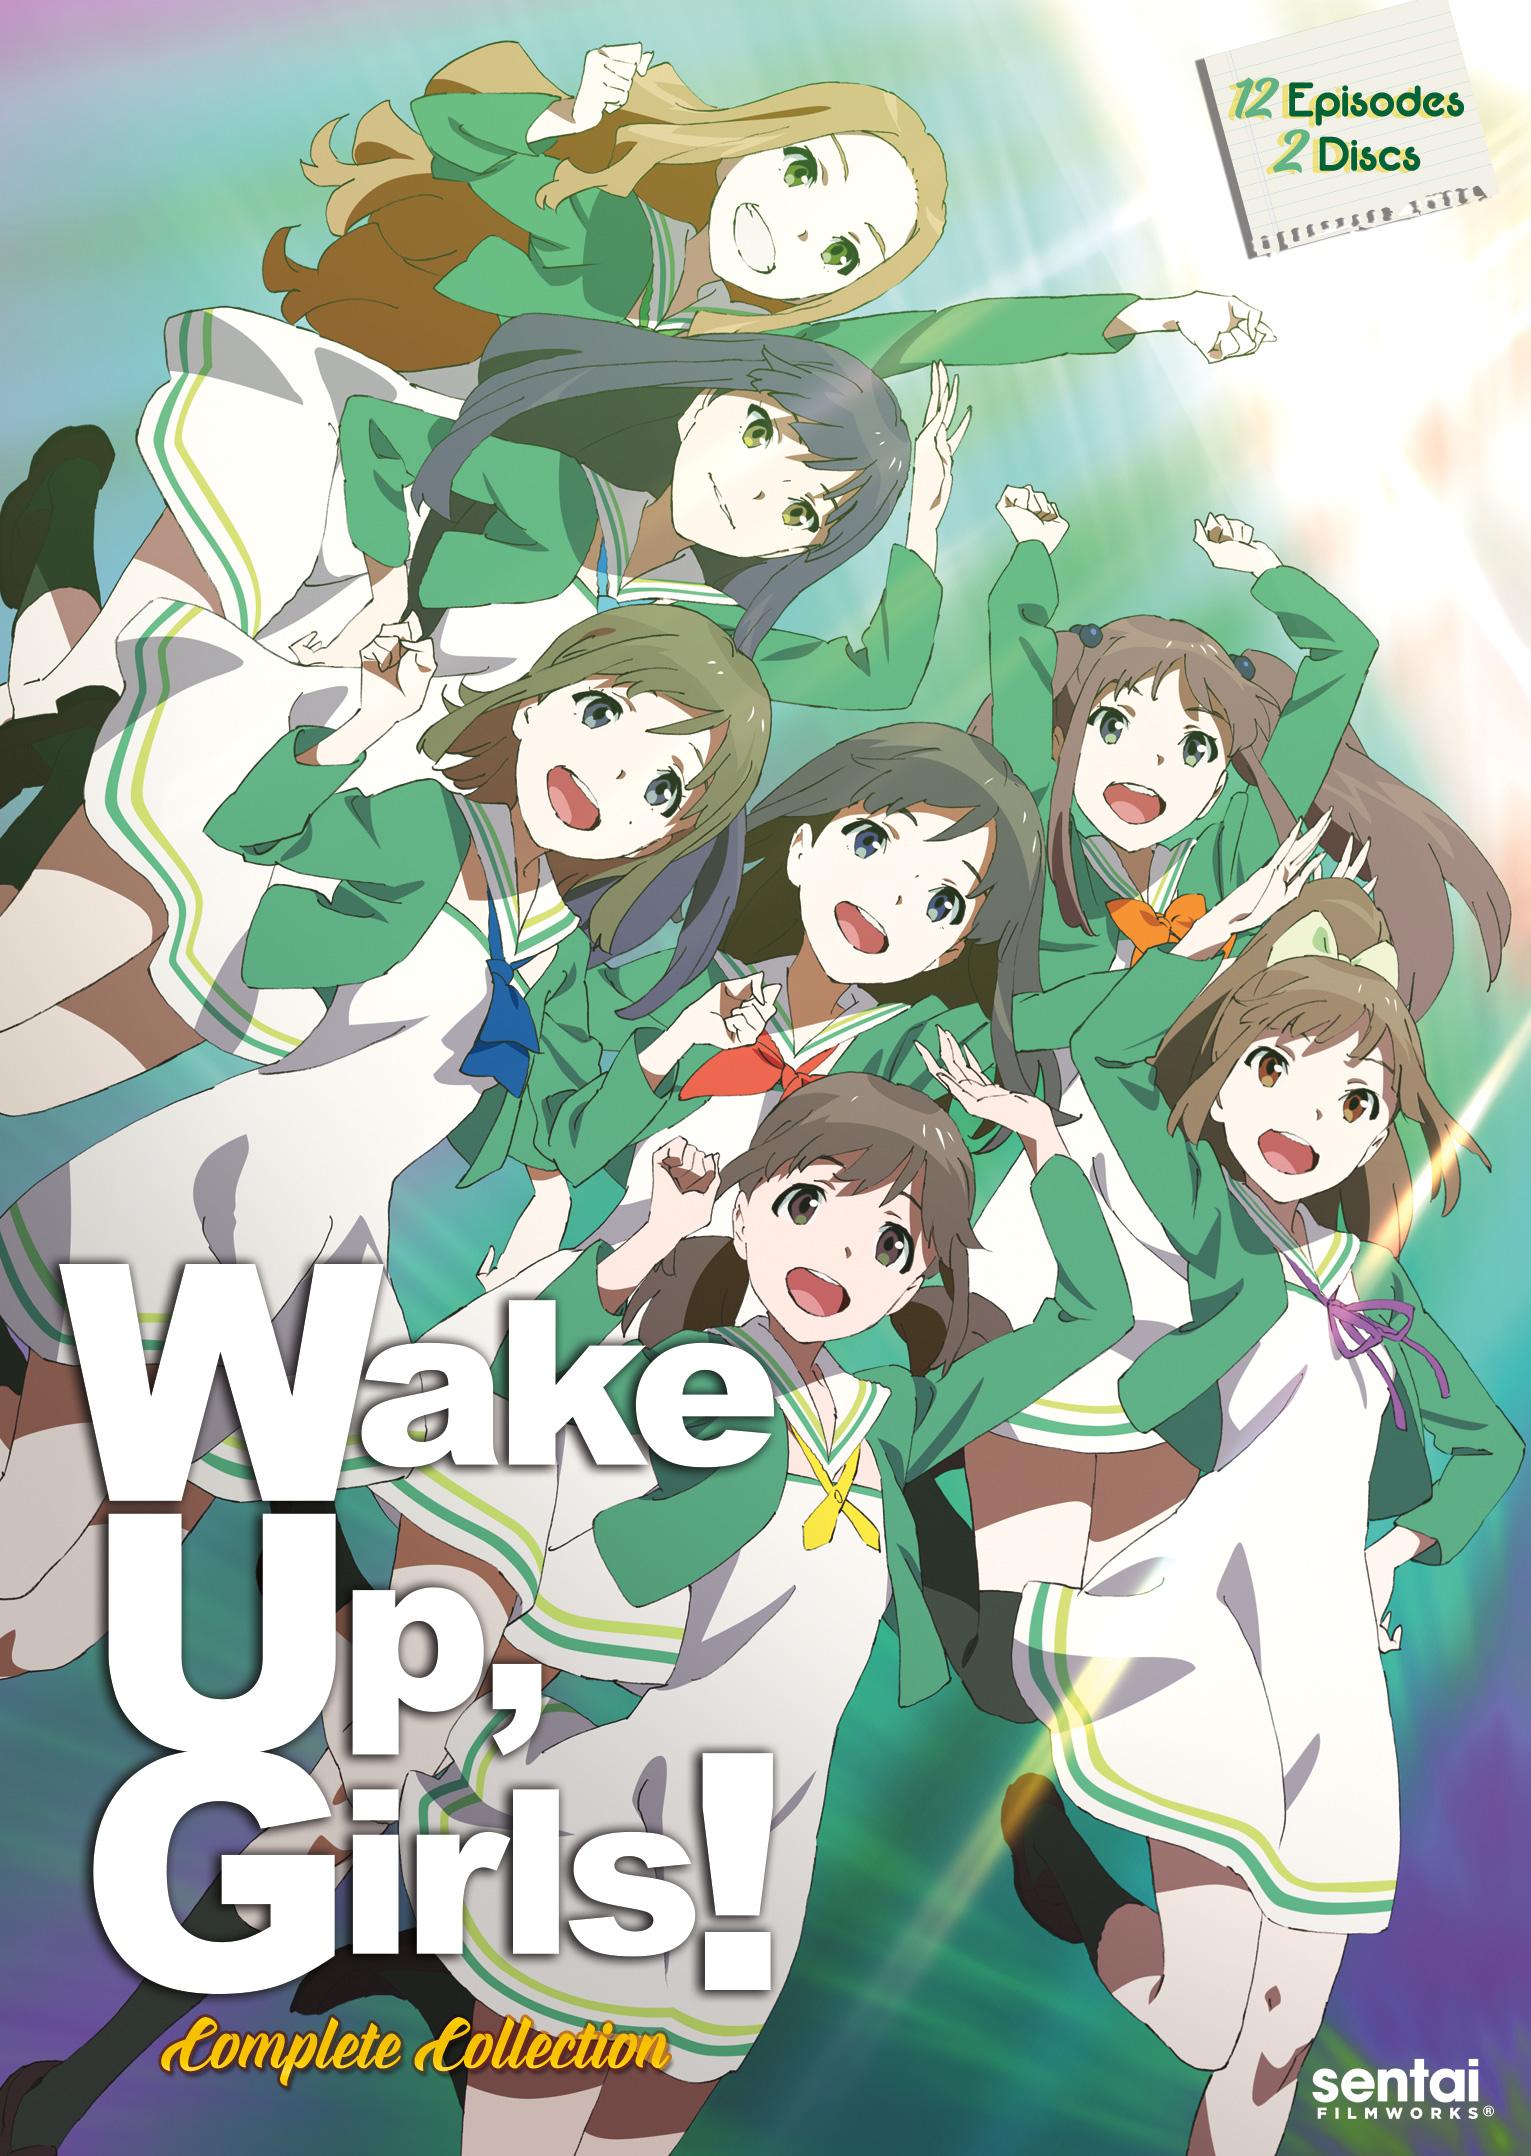 Wake Up, Girls! DVD 814131011381